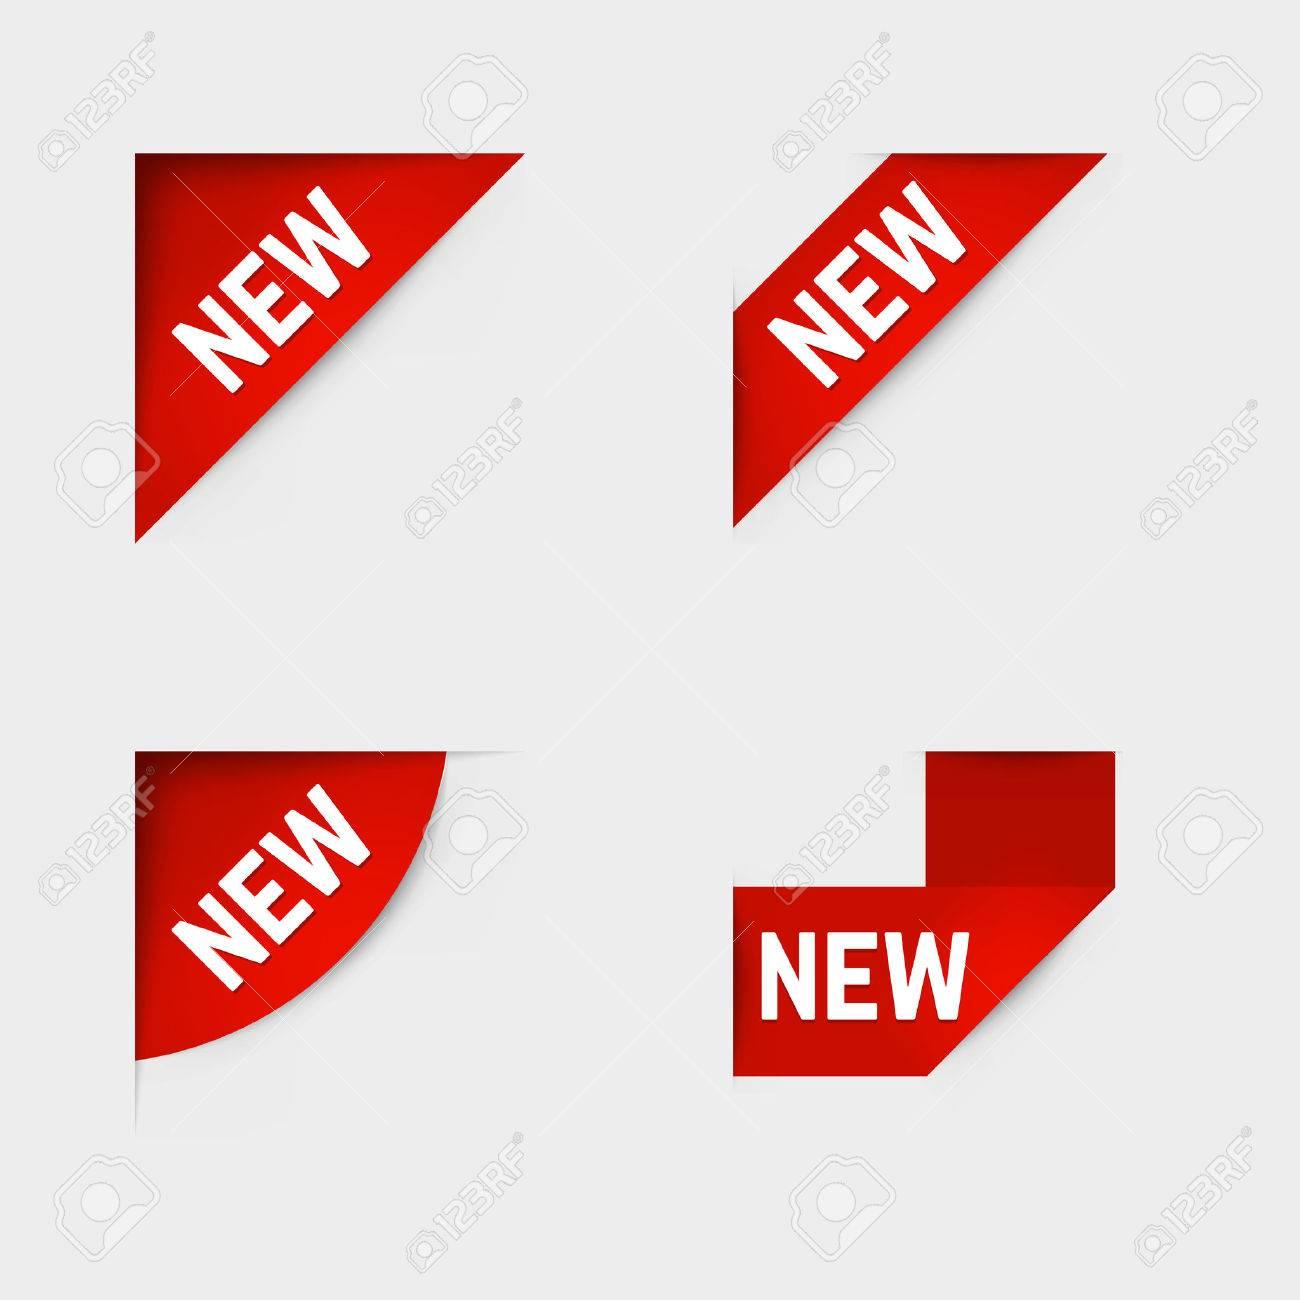 Red corner new labels. - 43647214